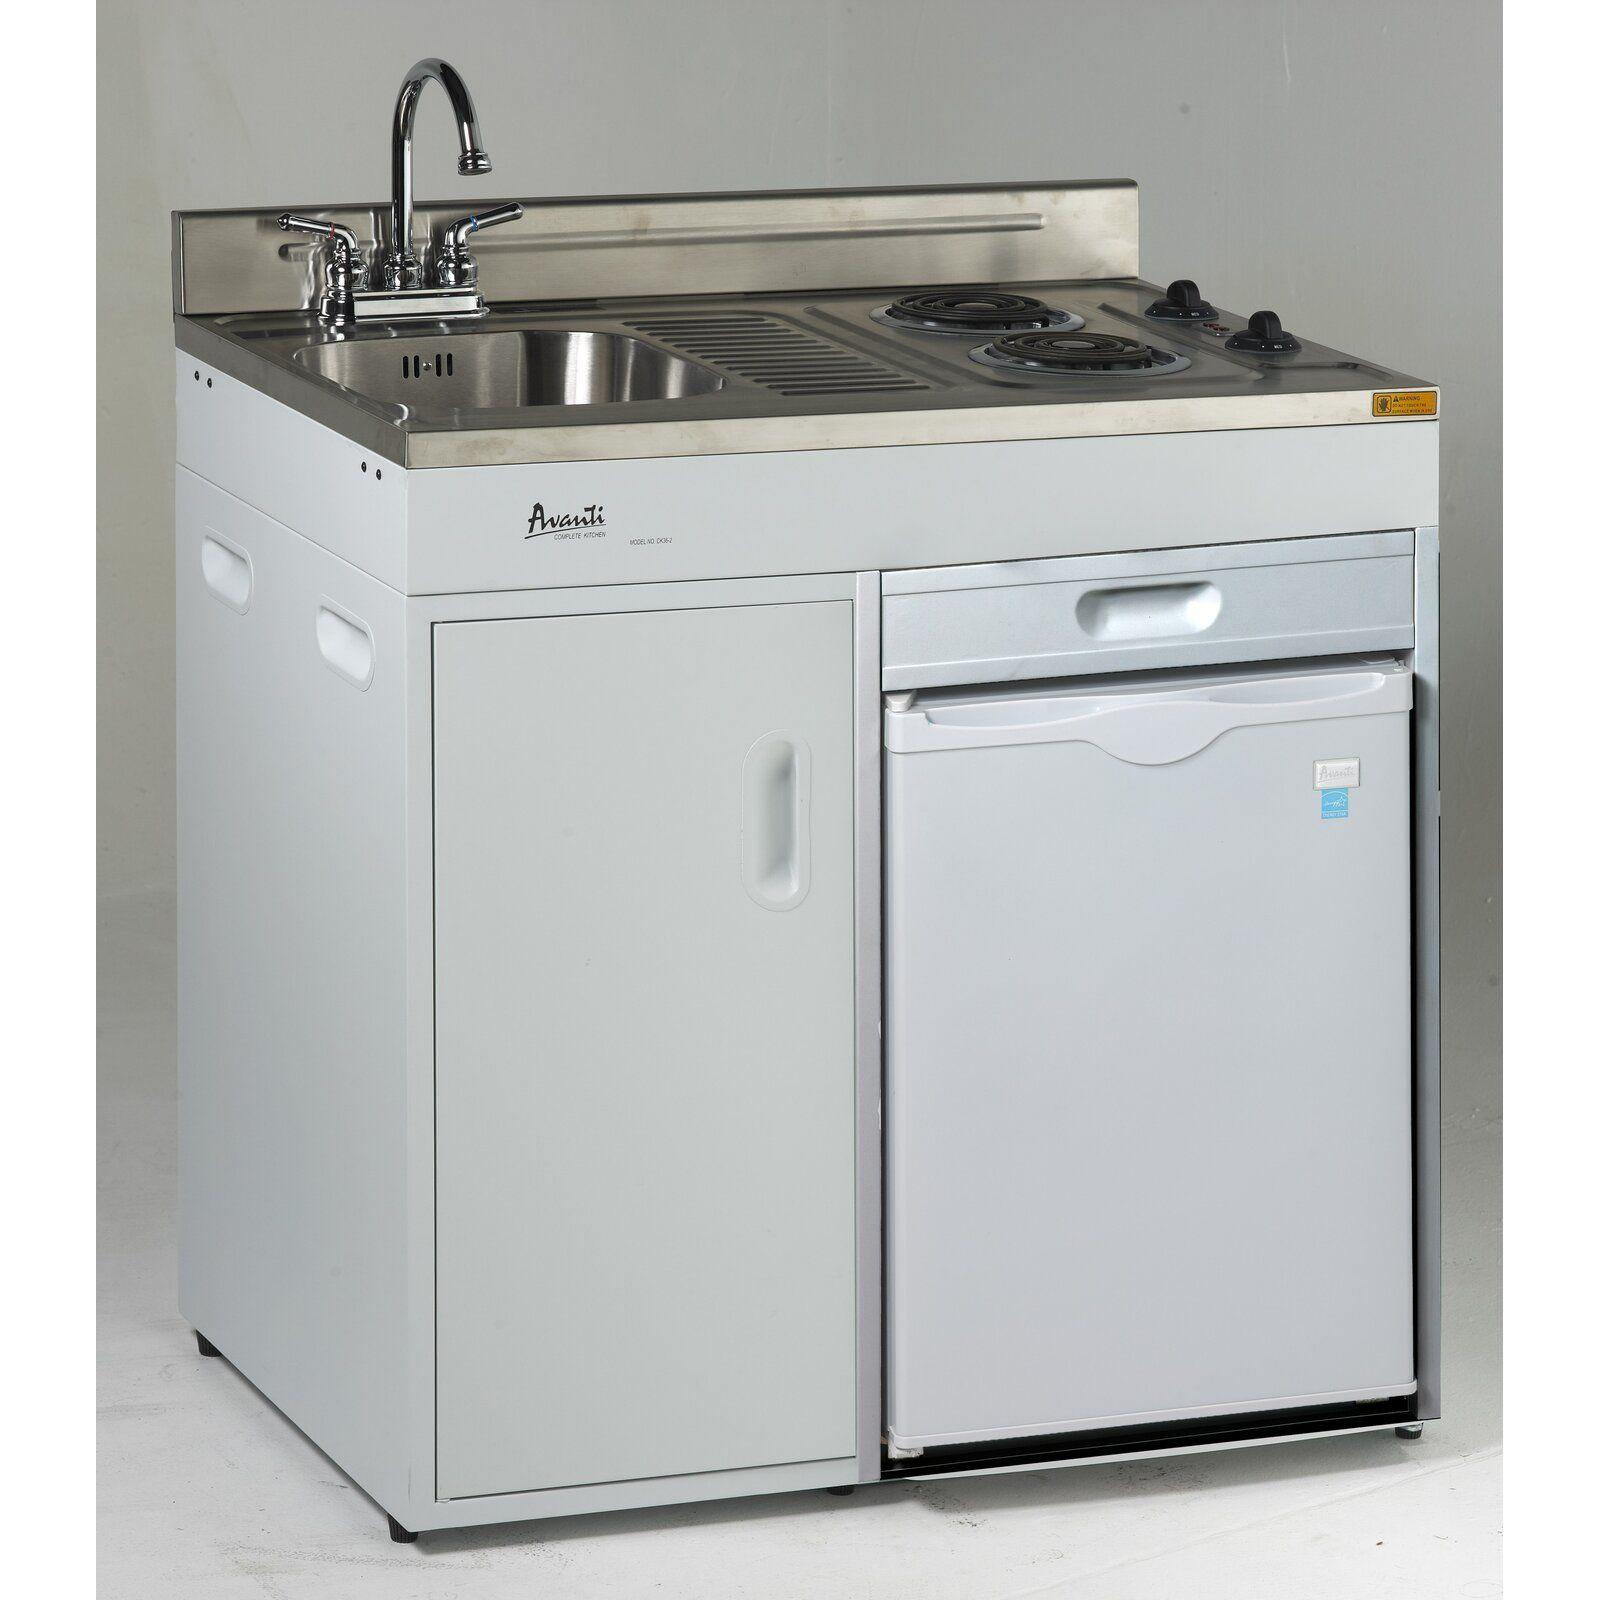 Avanti 2.2 cu. ft. Compact Refrigerator with Sink